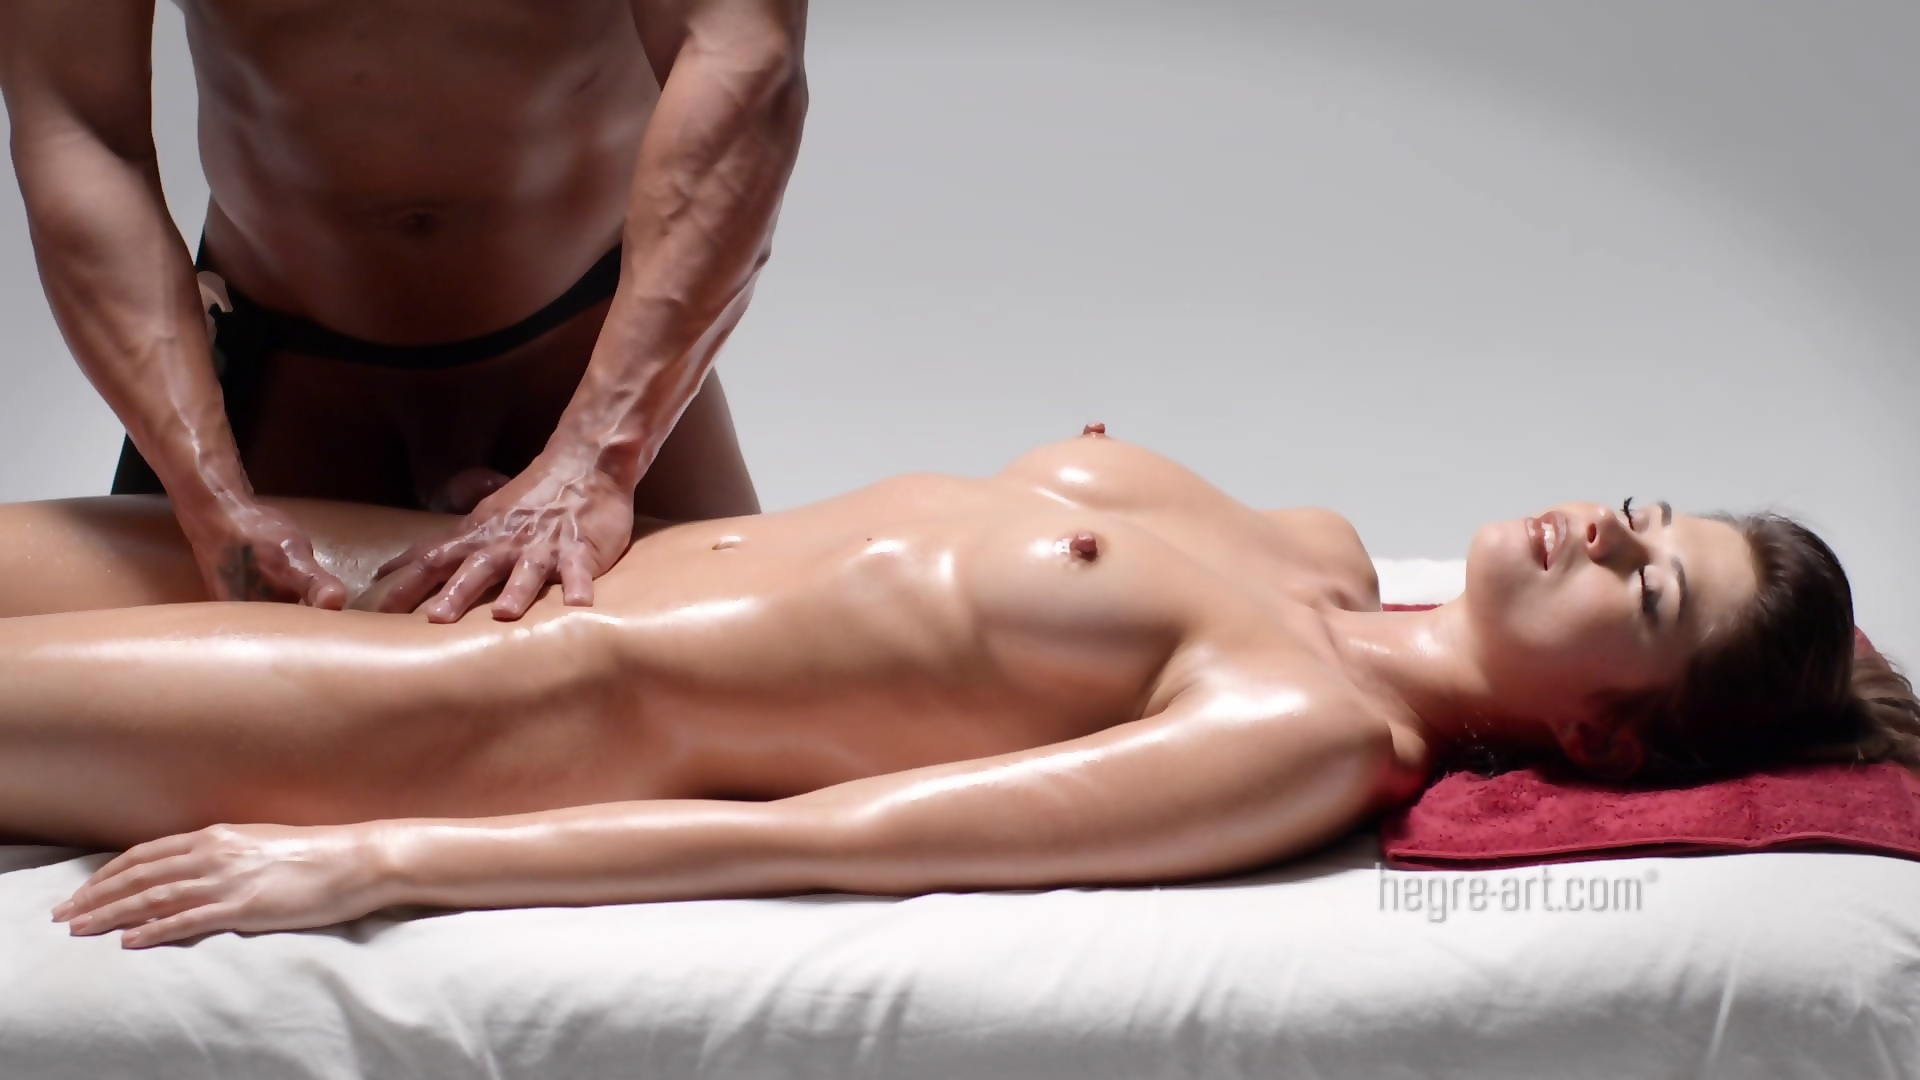 Erotic pussy massage videos